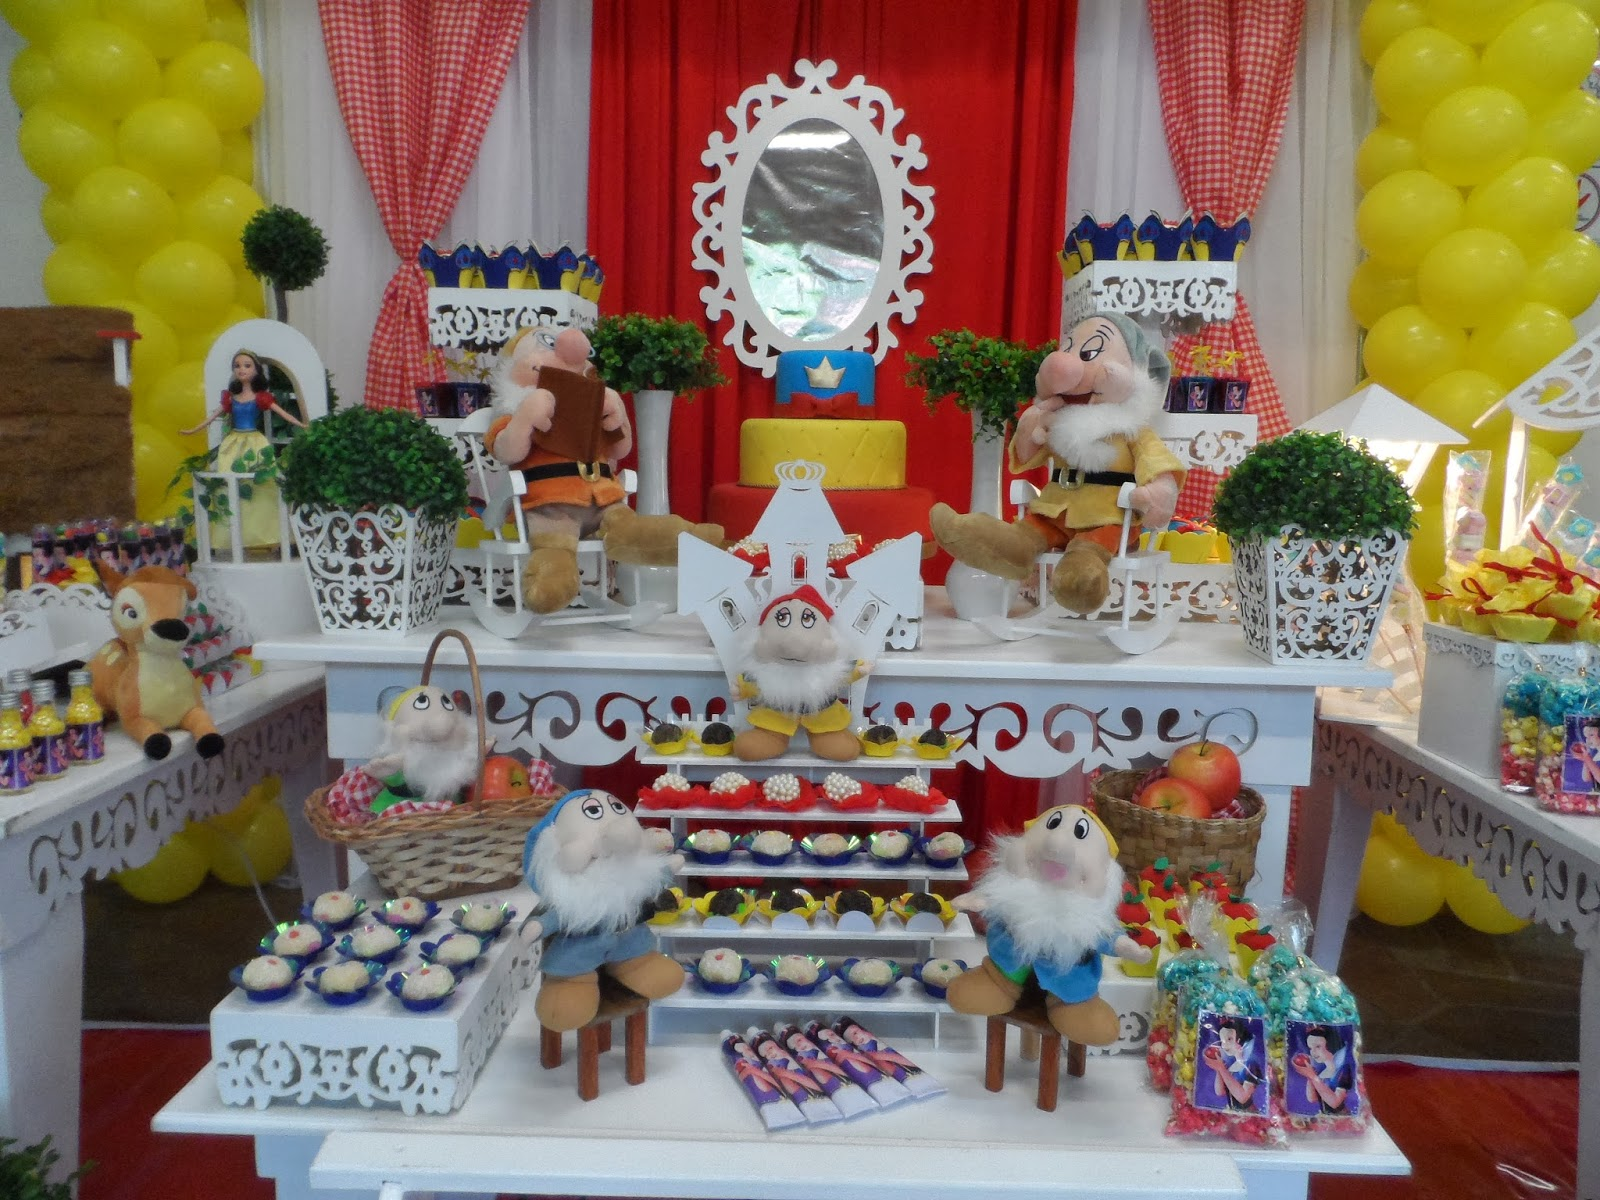 decoracao festa infantil branca de neve provencal:Crilê Decorações de Festas Infantis: BRANCA DE NEVE PROVENÇAL